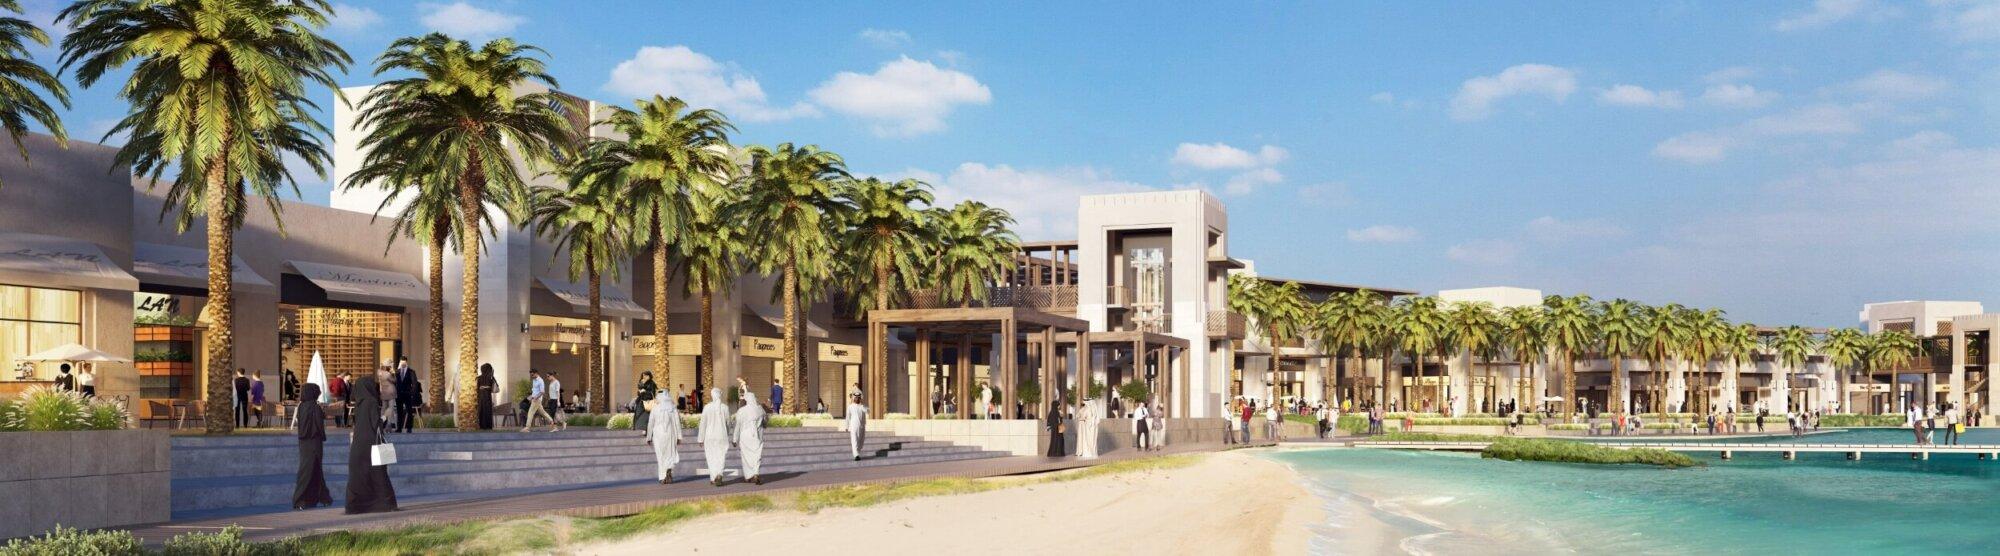 Kalba Waterfront Mall United Arab Emirates